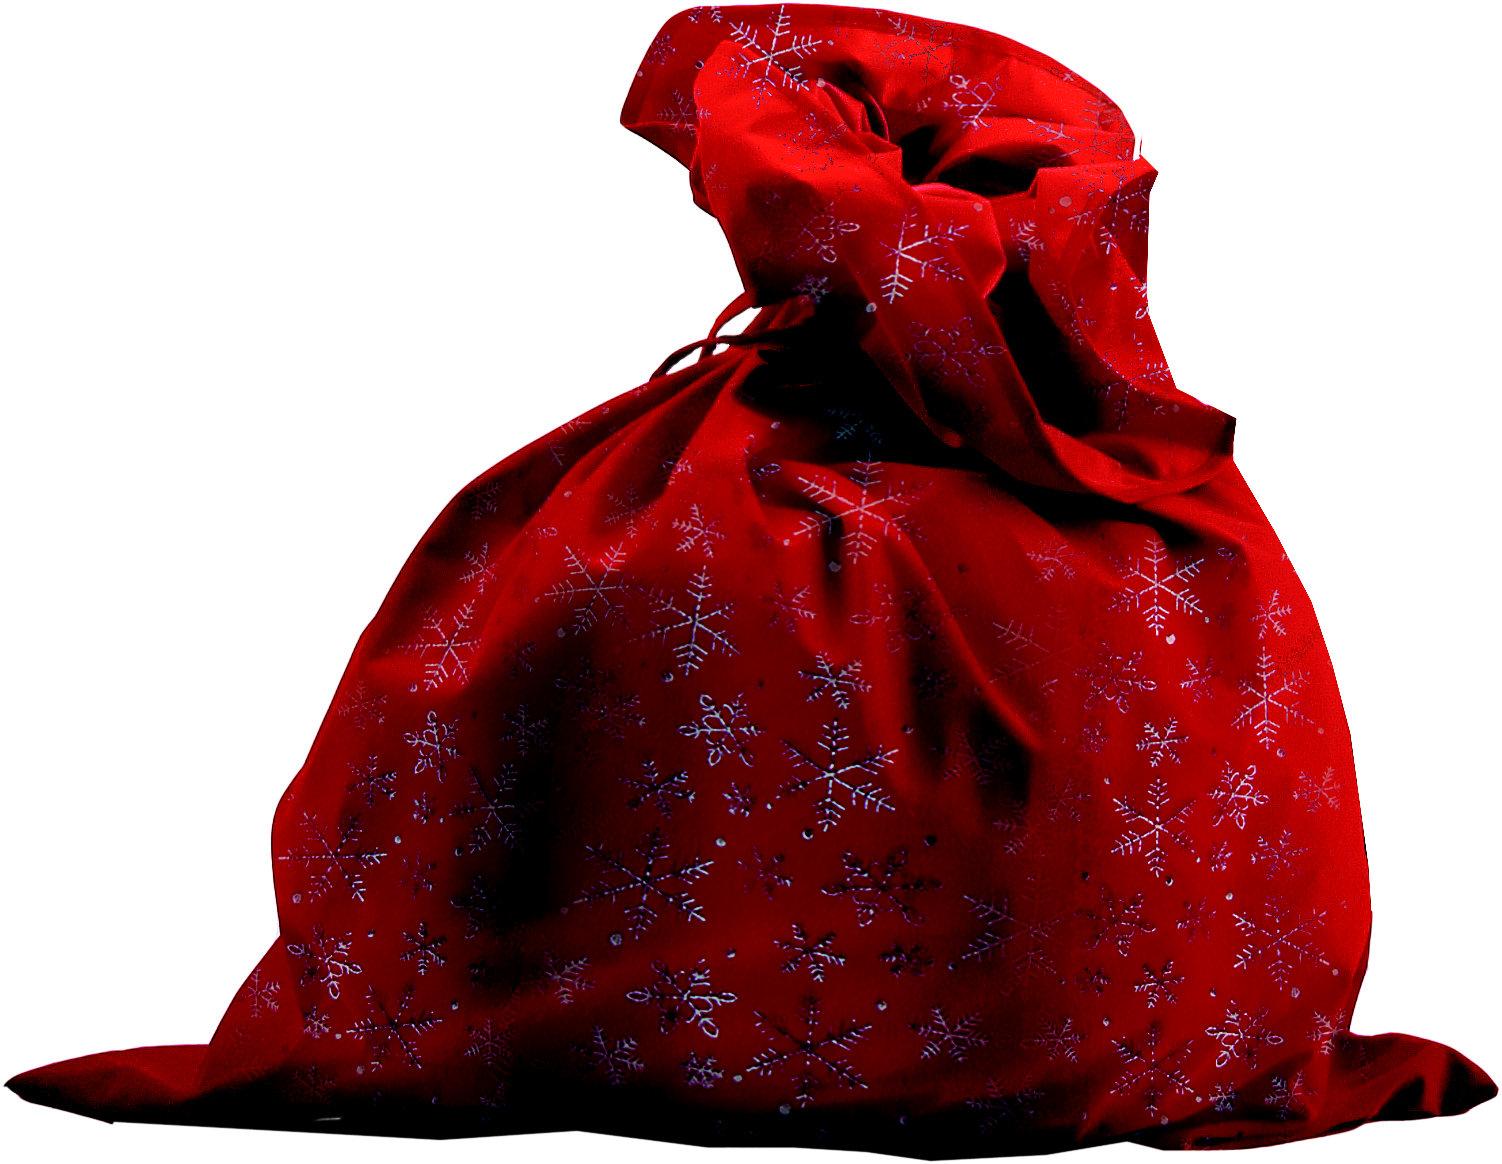 Костюмы и маски Батик Мешок Деда Мороза Батик со снежинками красный сатиновый красный костюм деда мороза 54 56